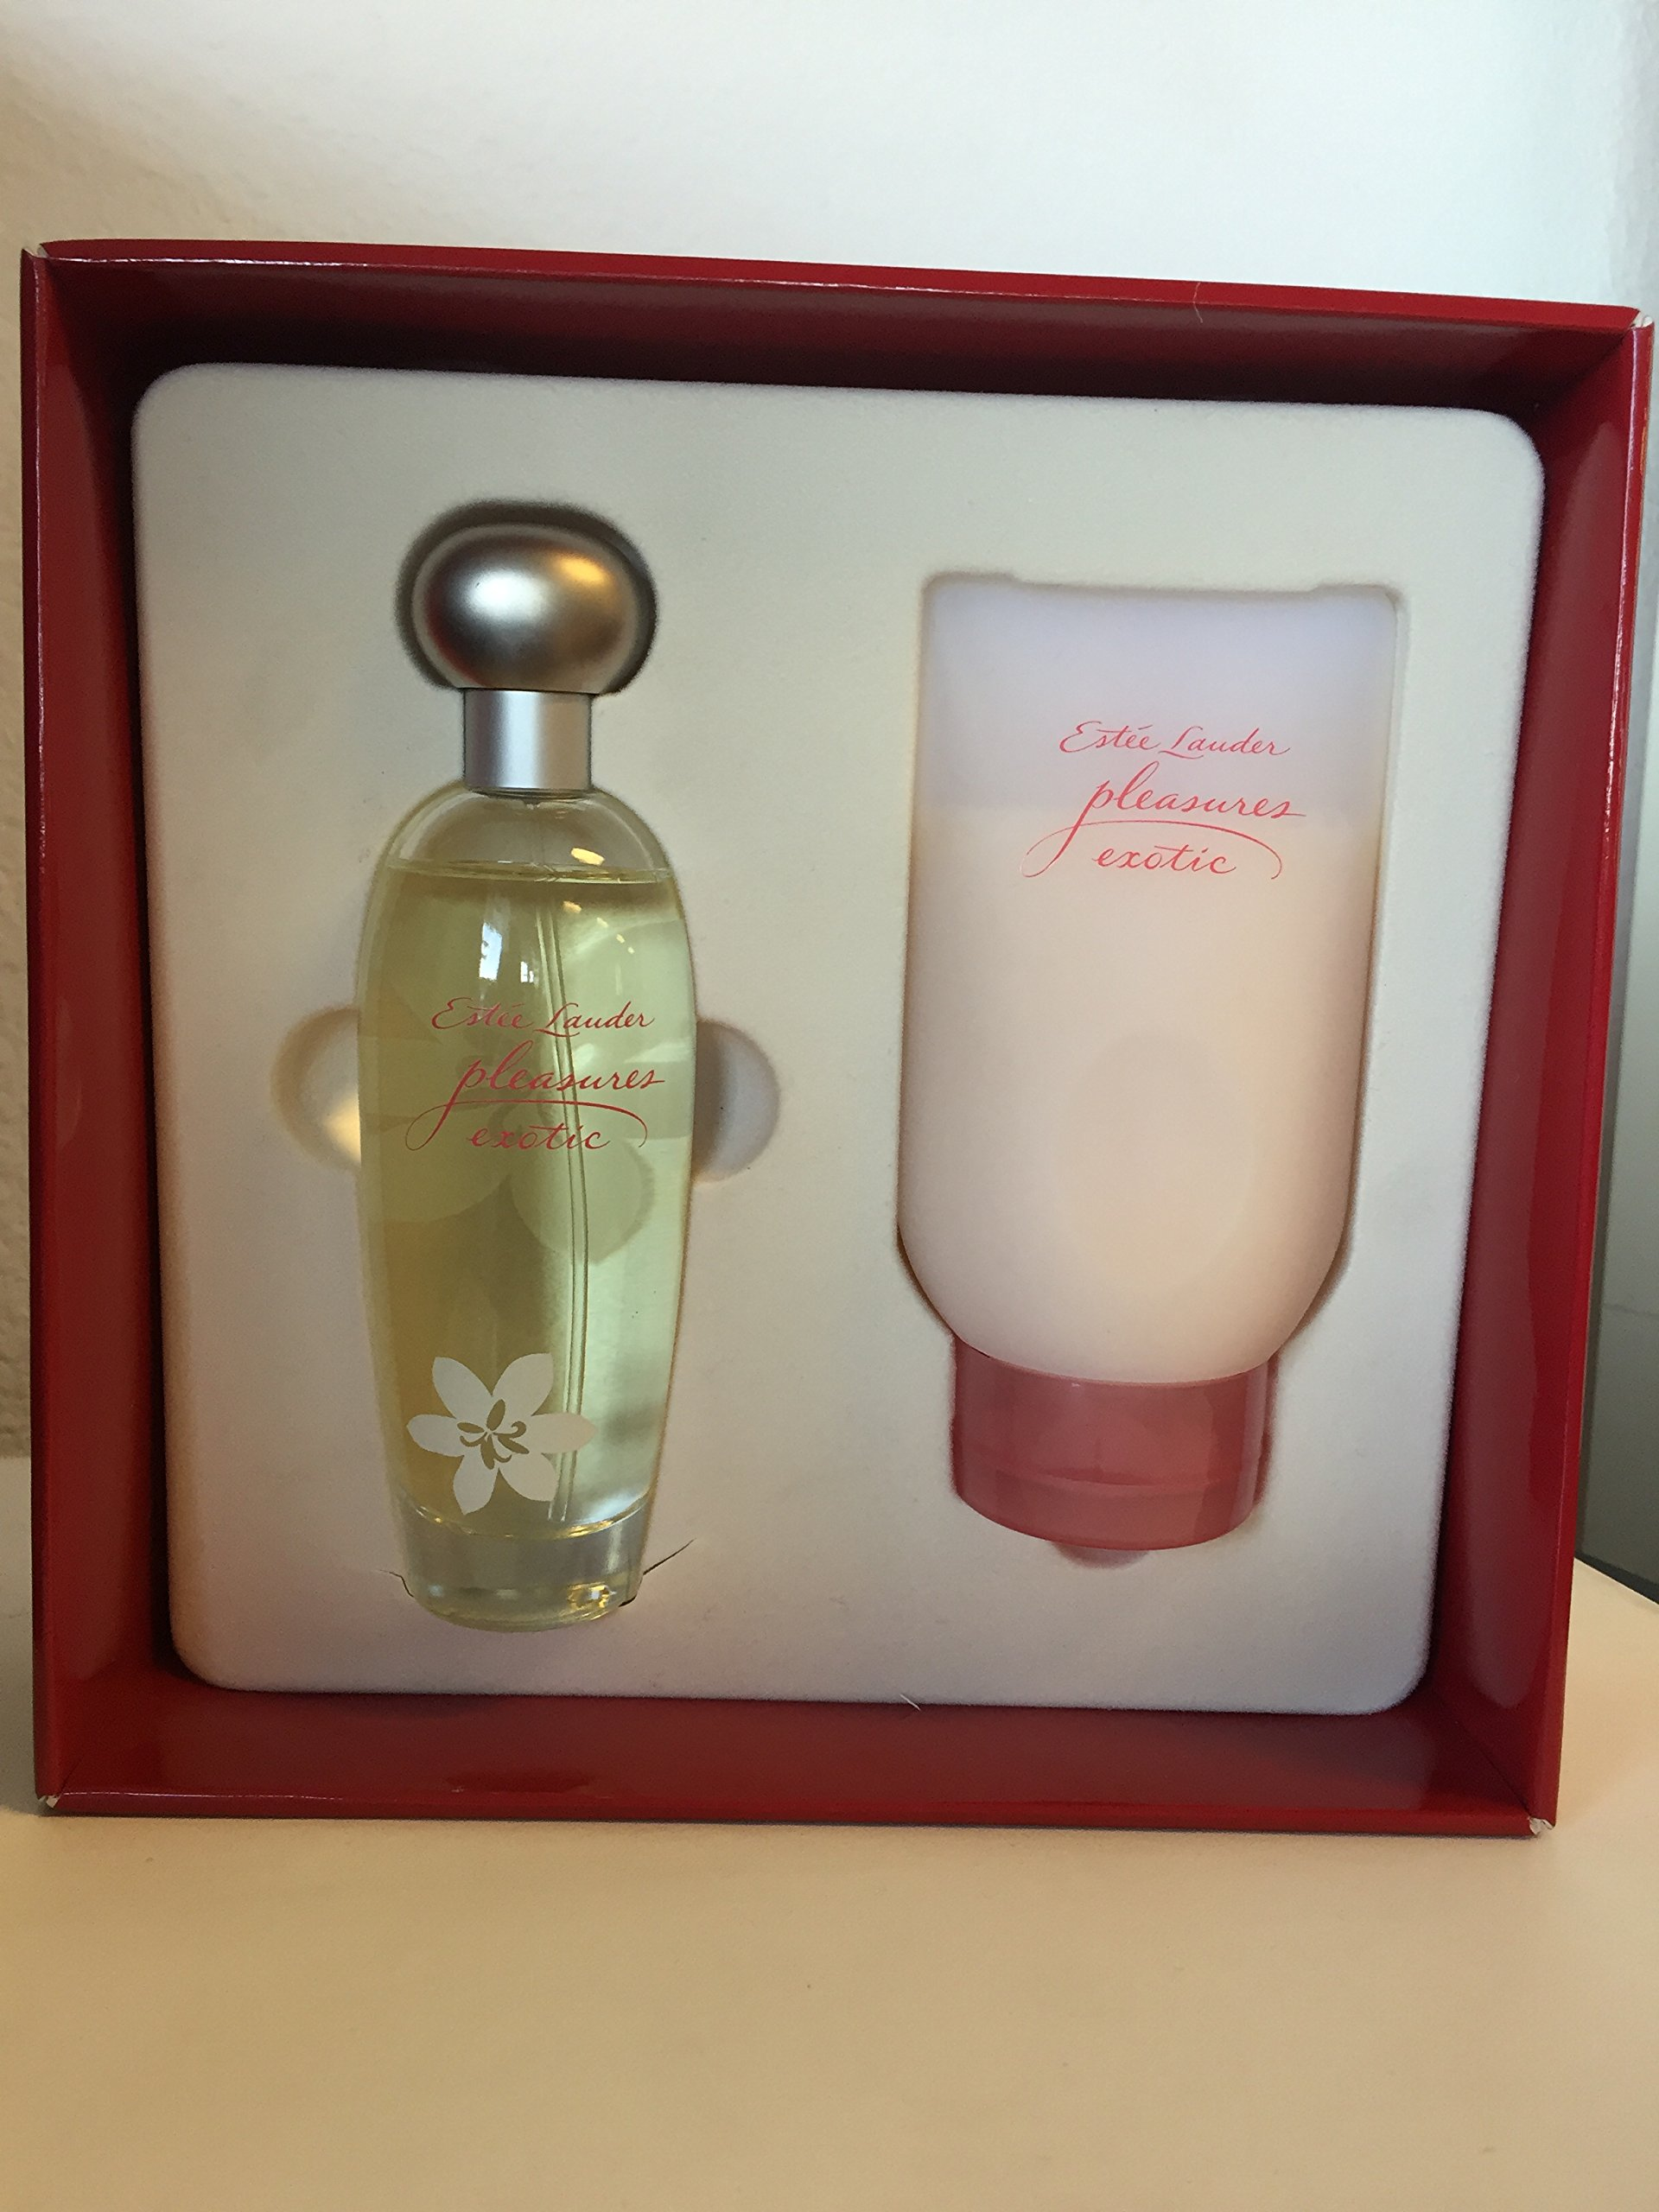 Pleasures Exotic By Estee Lauder for Women 3.4 Oz EDP Spray + 5.0 Oz Shower Gel